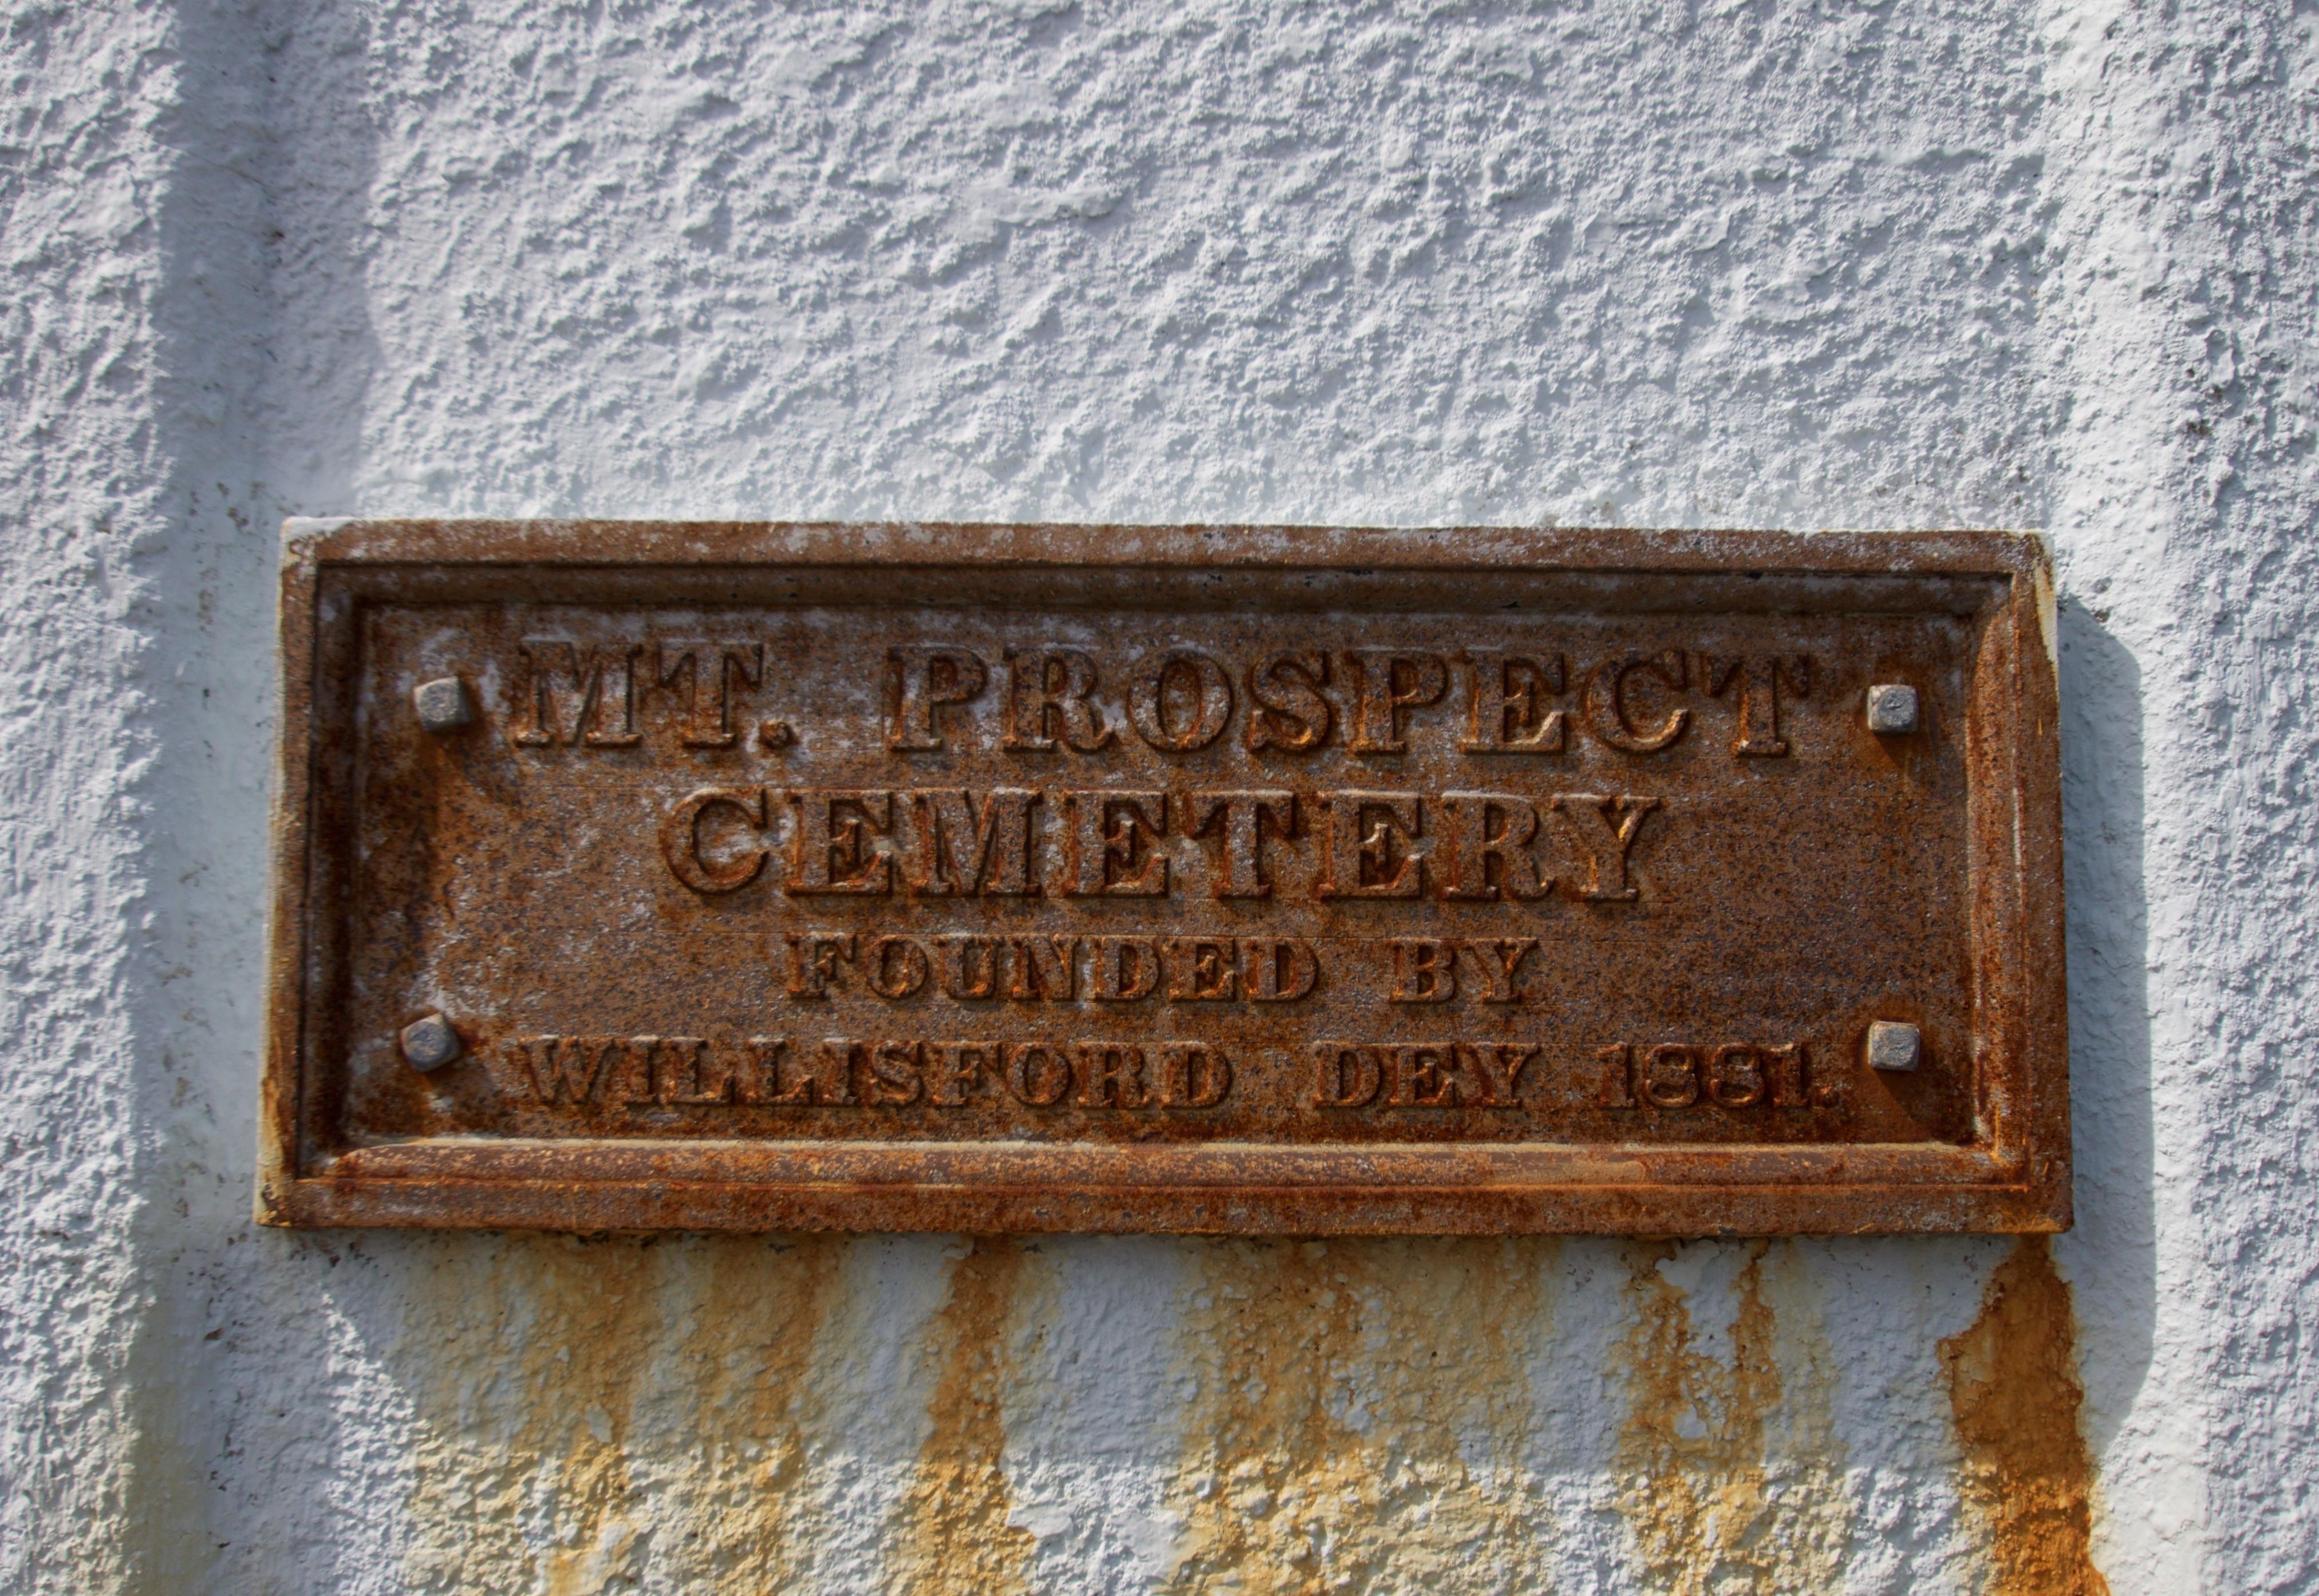 Mount Prospect Cemetery image 2